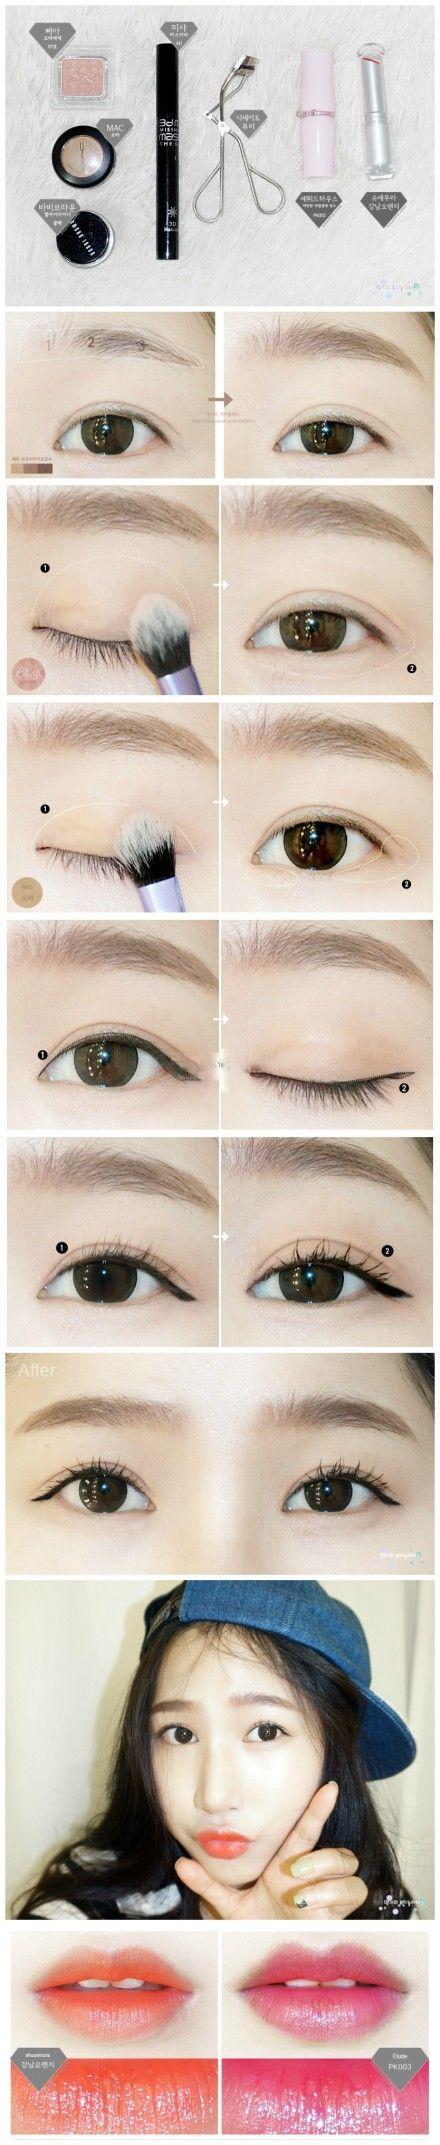 natural looking Korean make up #koreanmakeup #eyeliner